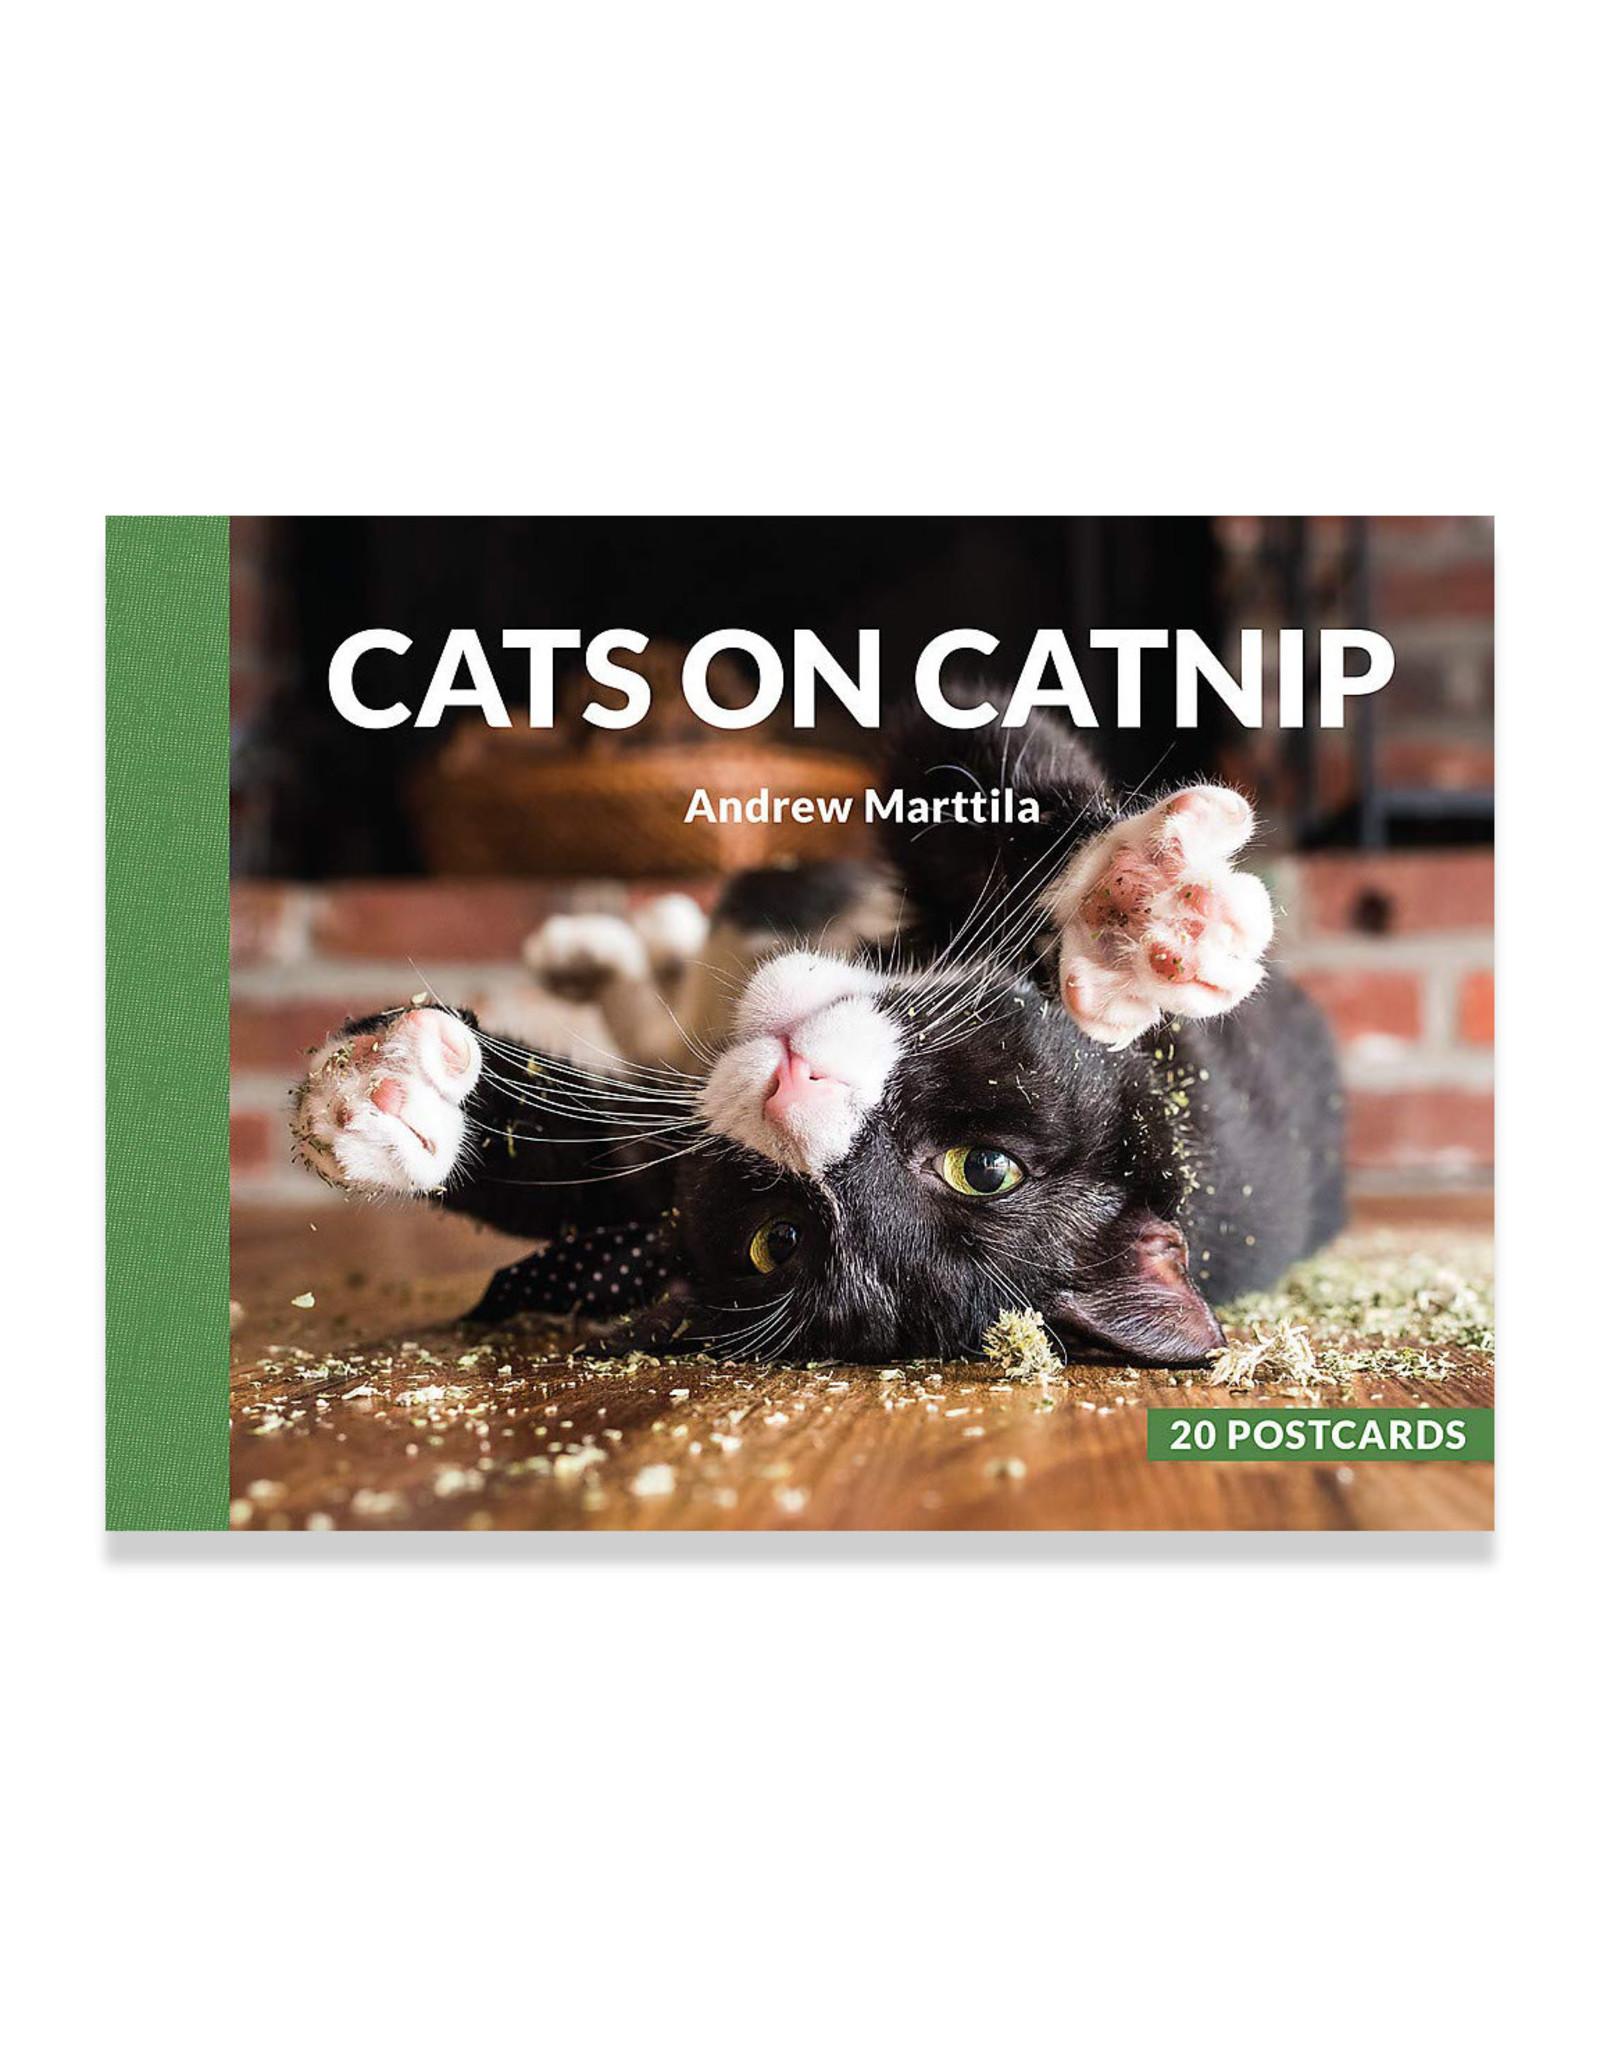 Cats on Catnip Postcard Set